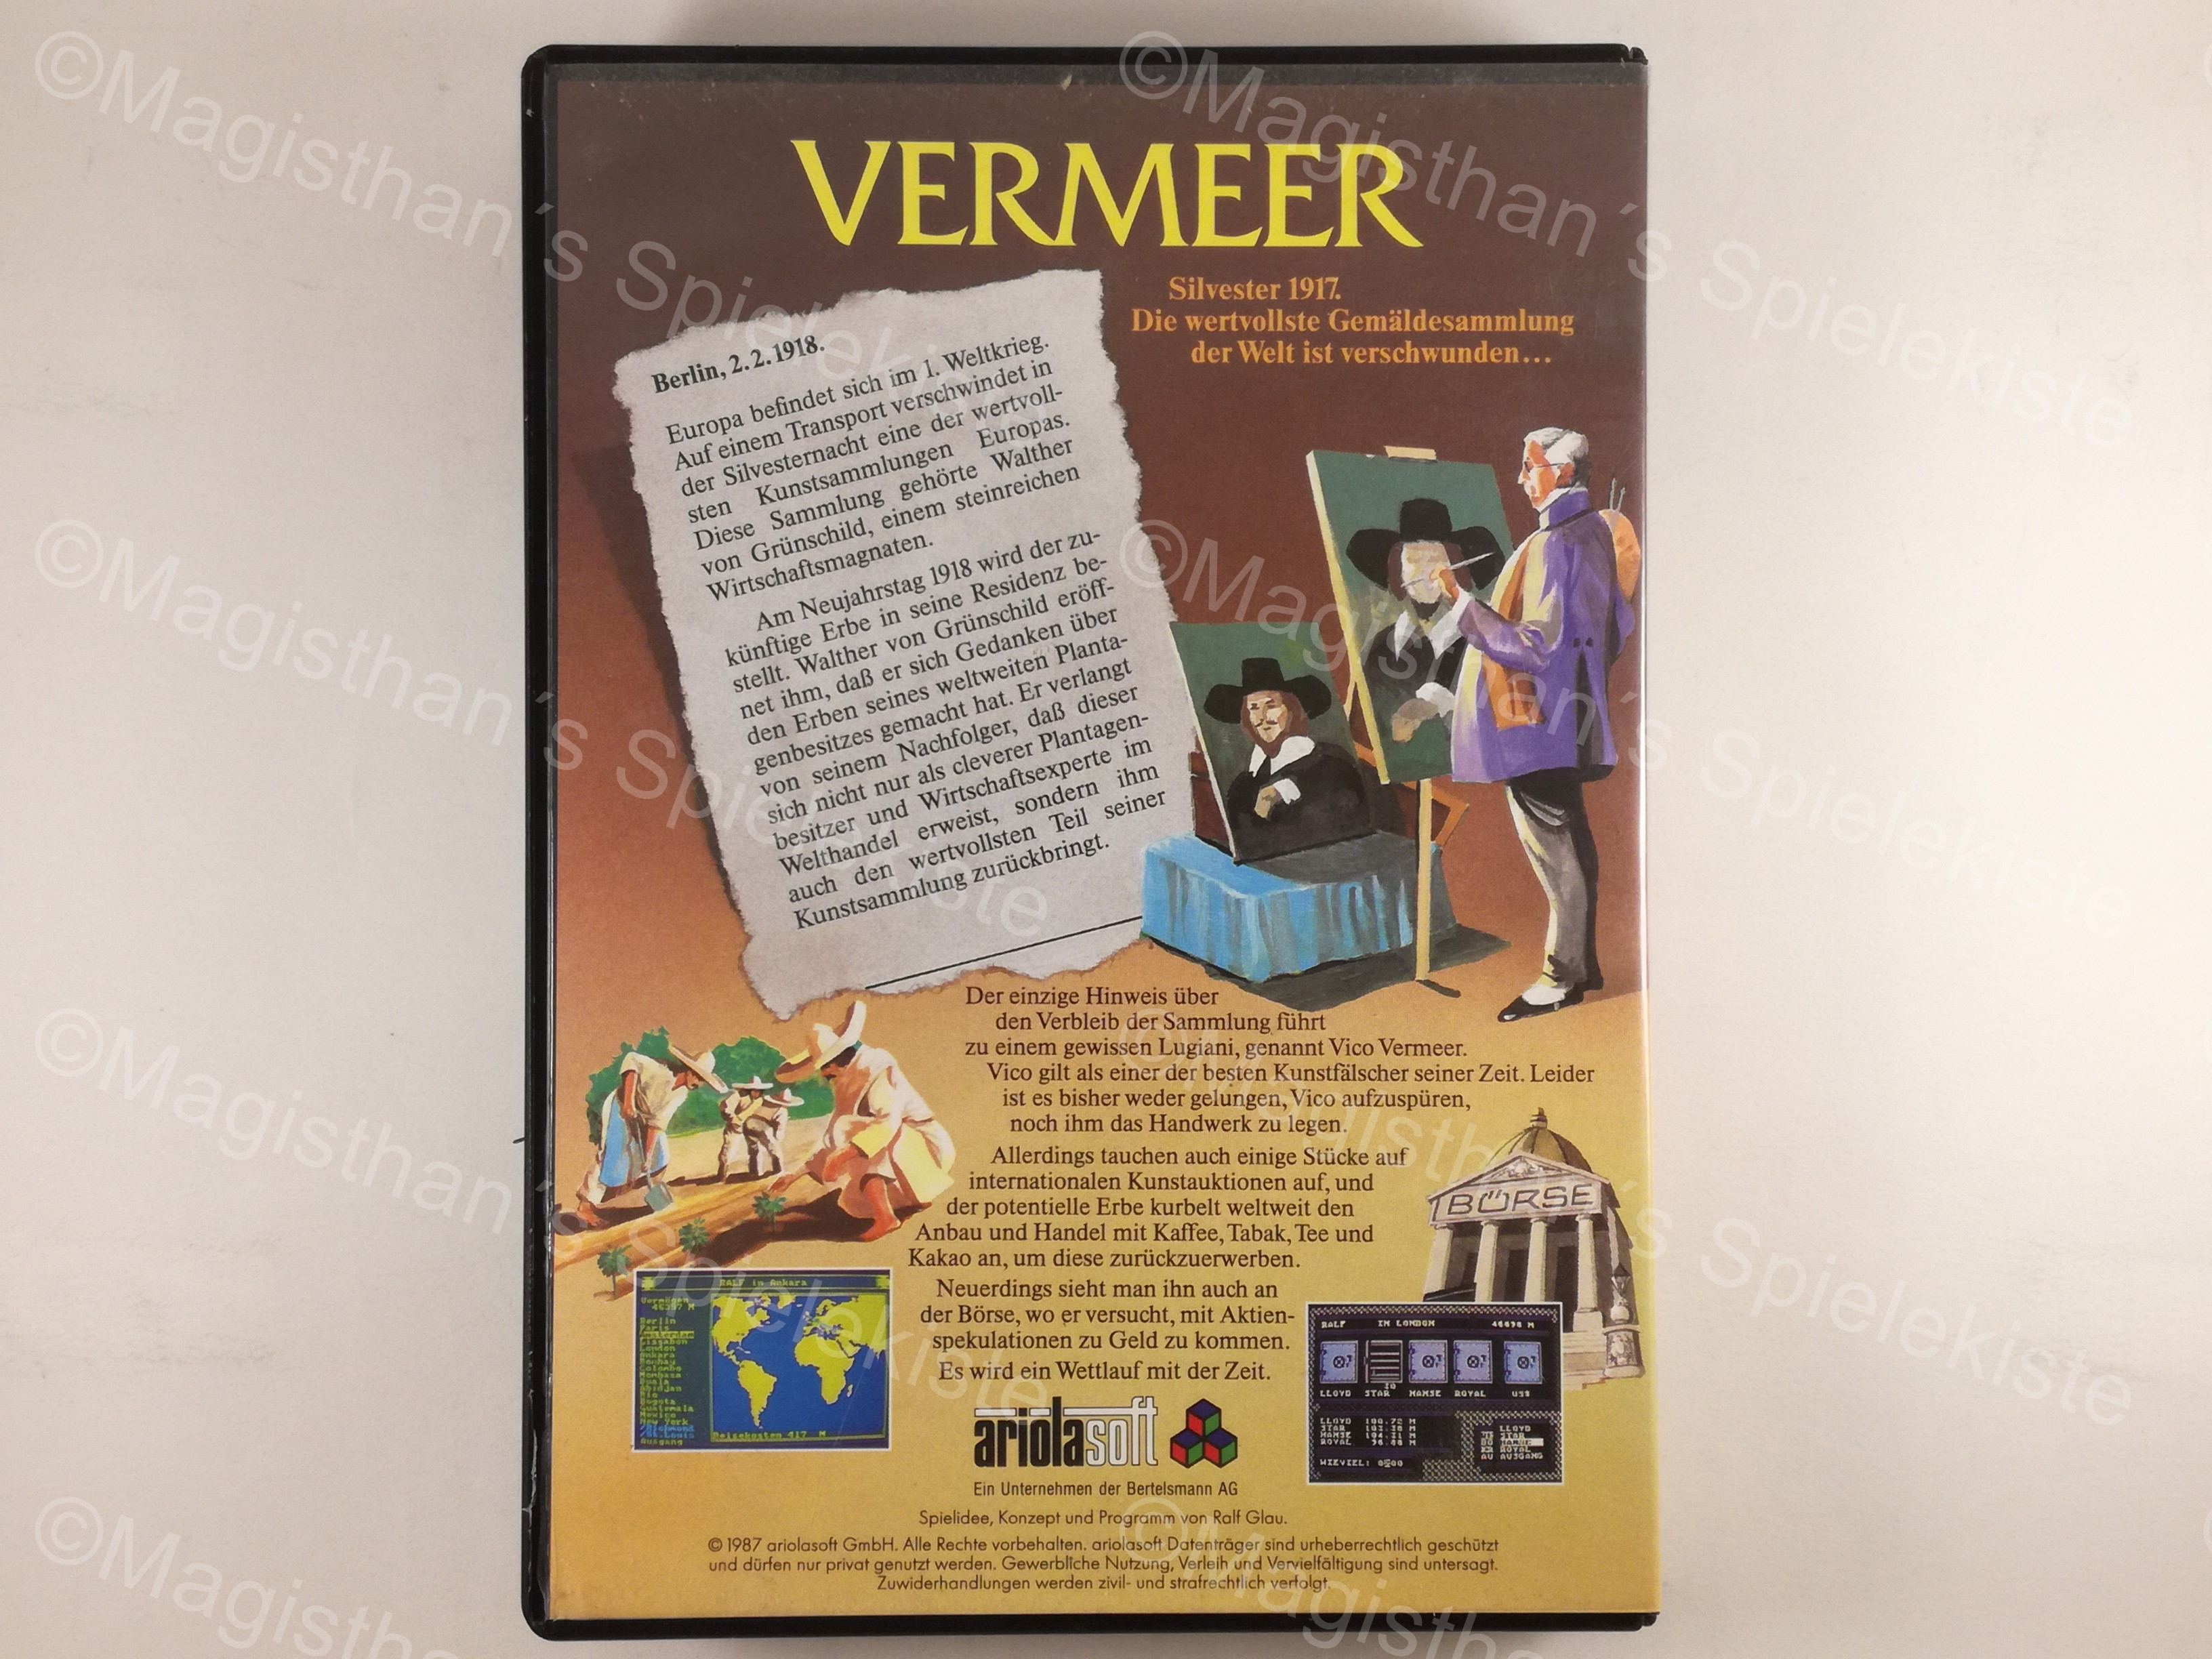 VermeerAtari1_back.jpg